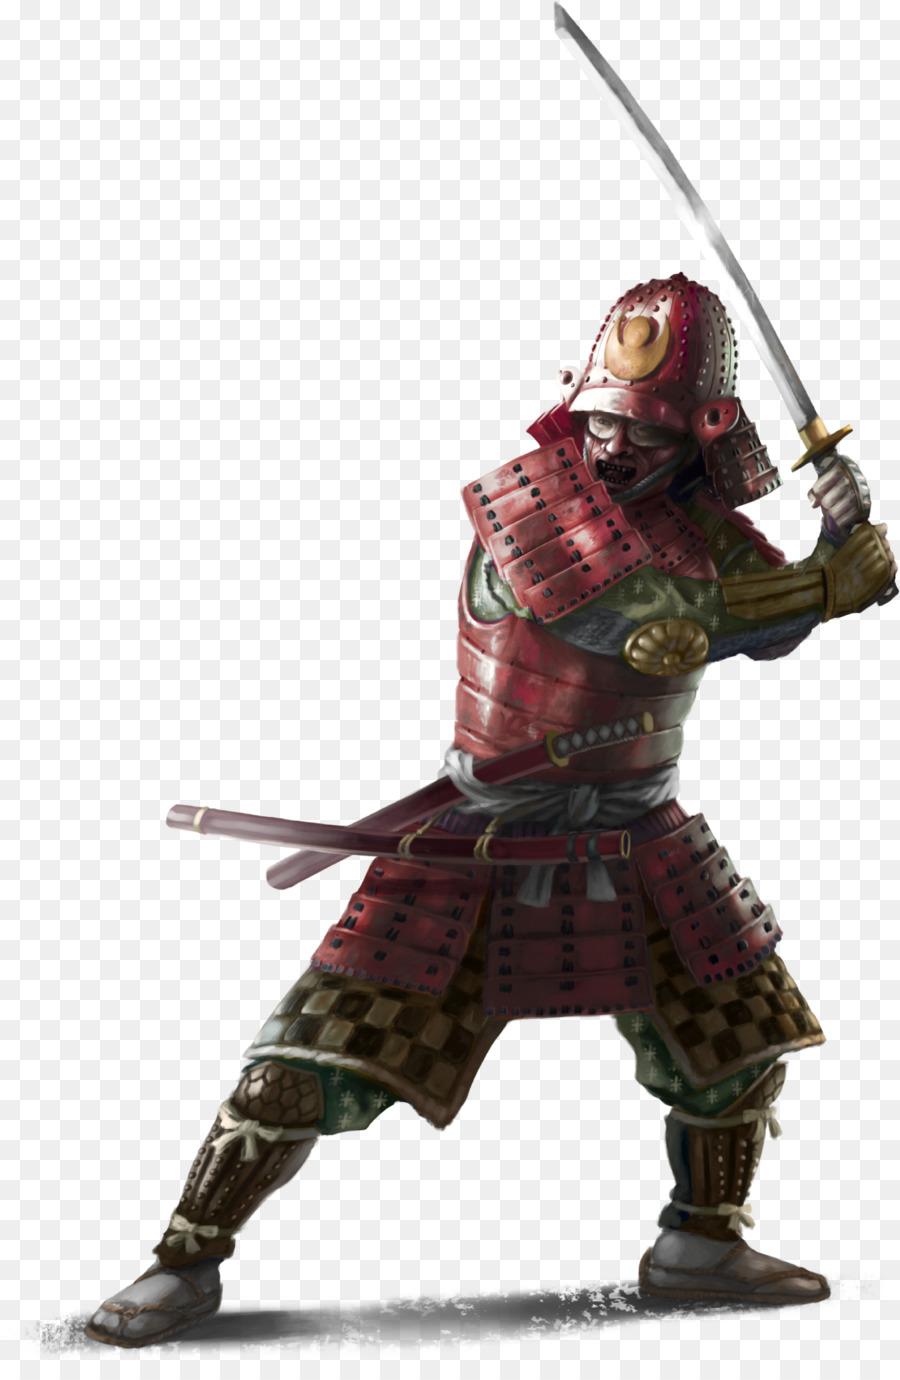 for honor city samurai warrior hero 3d miniature samurai png